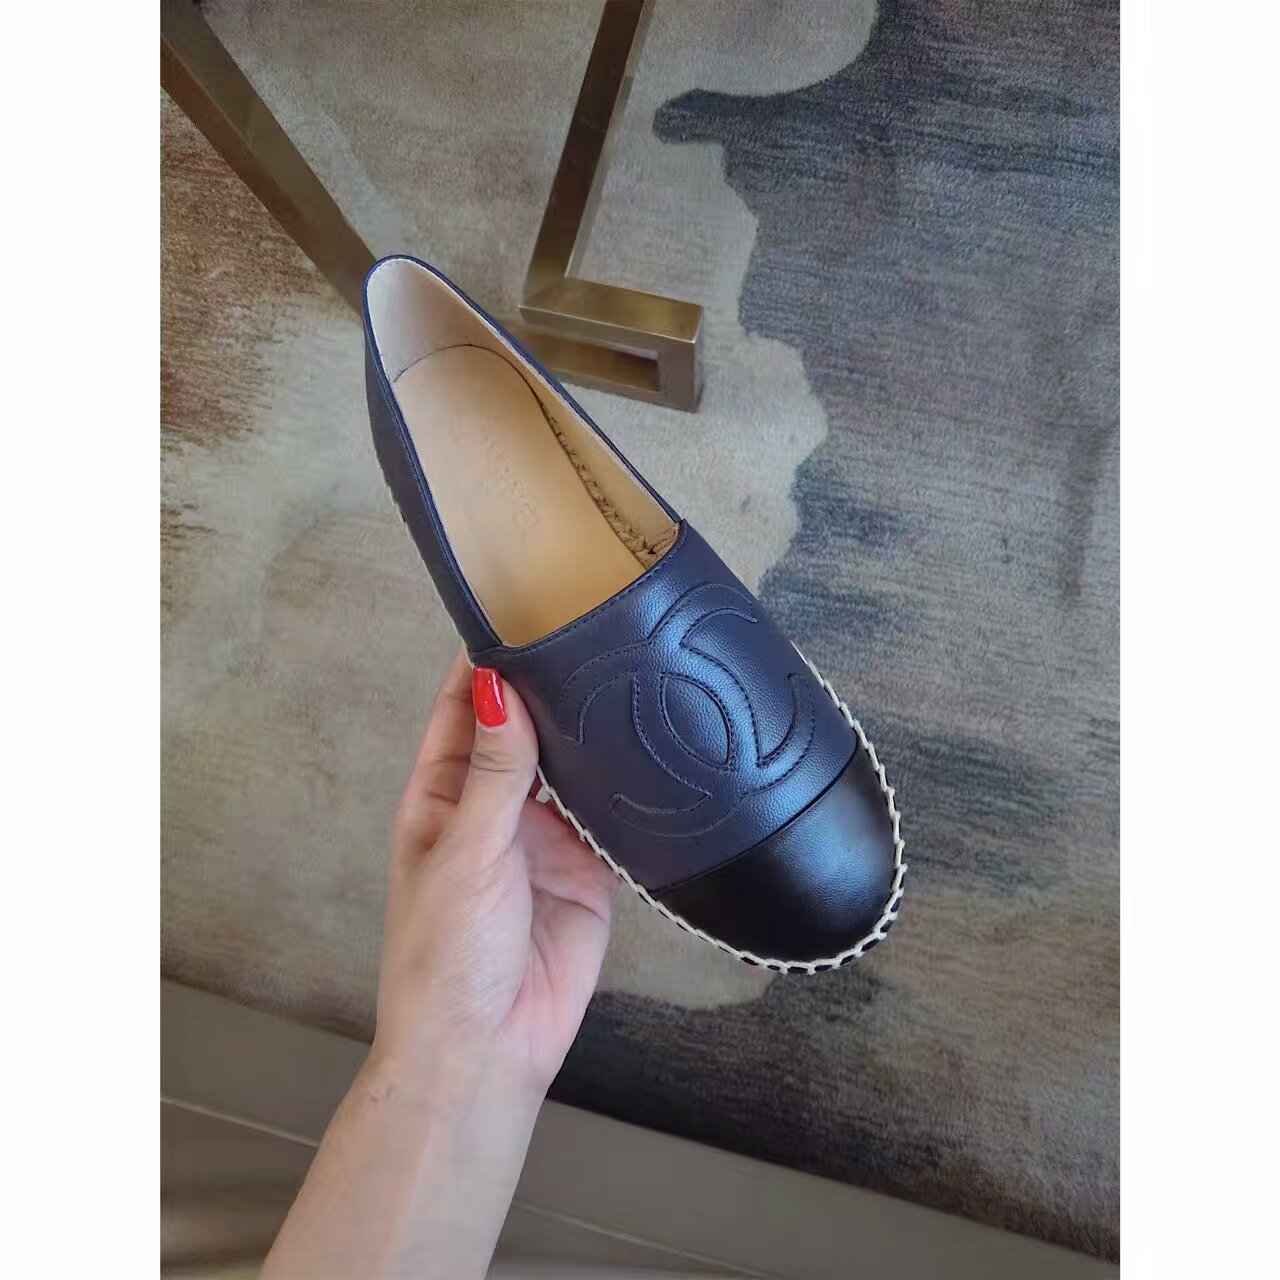 【CHANEL香奈儿】皮面渔夫鞋